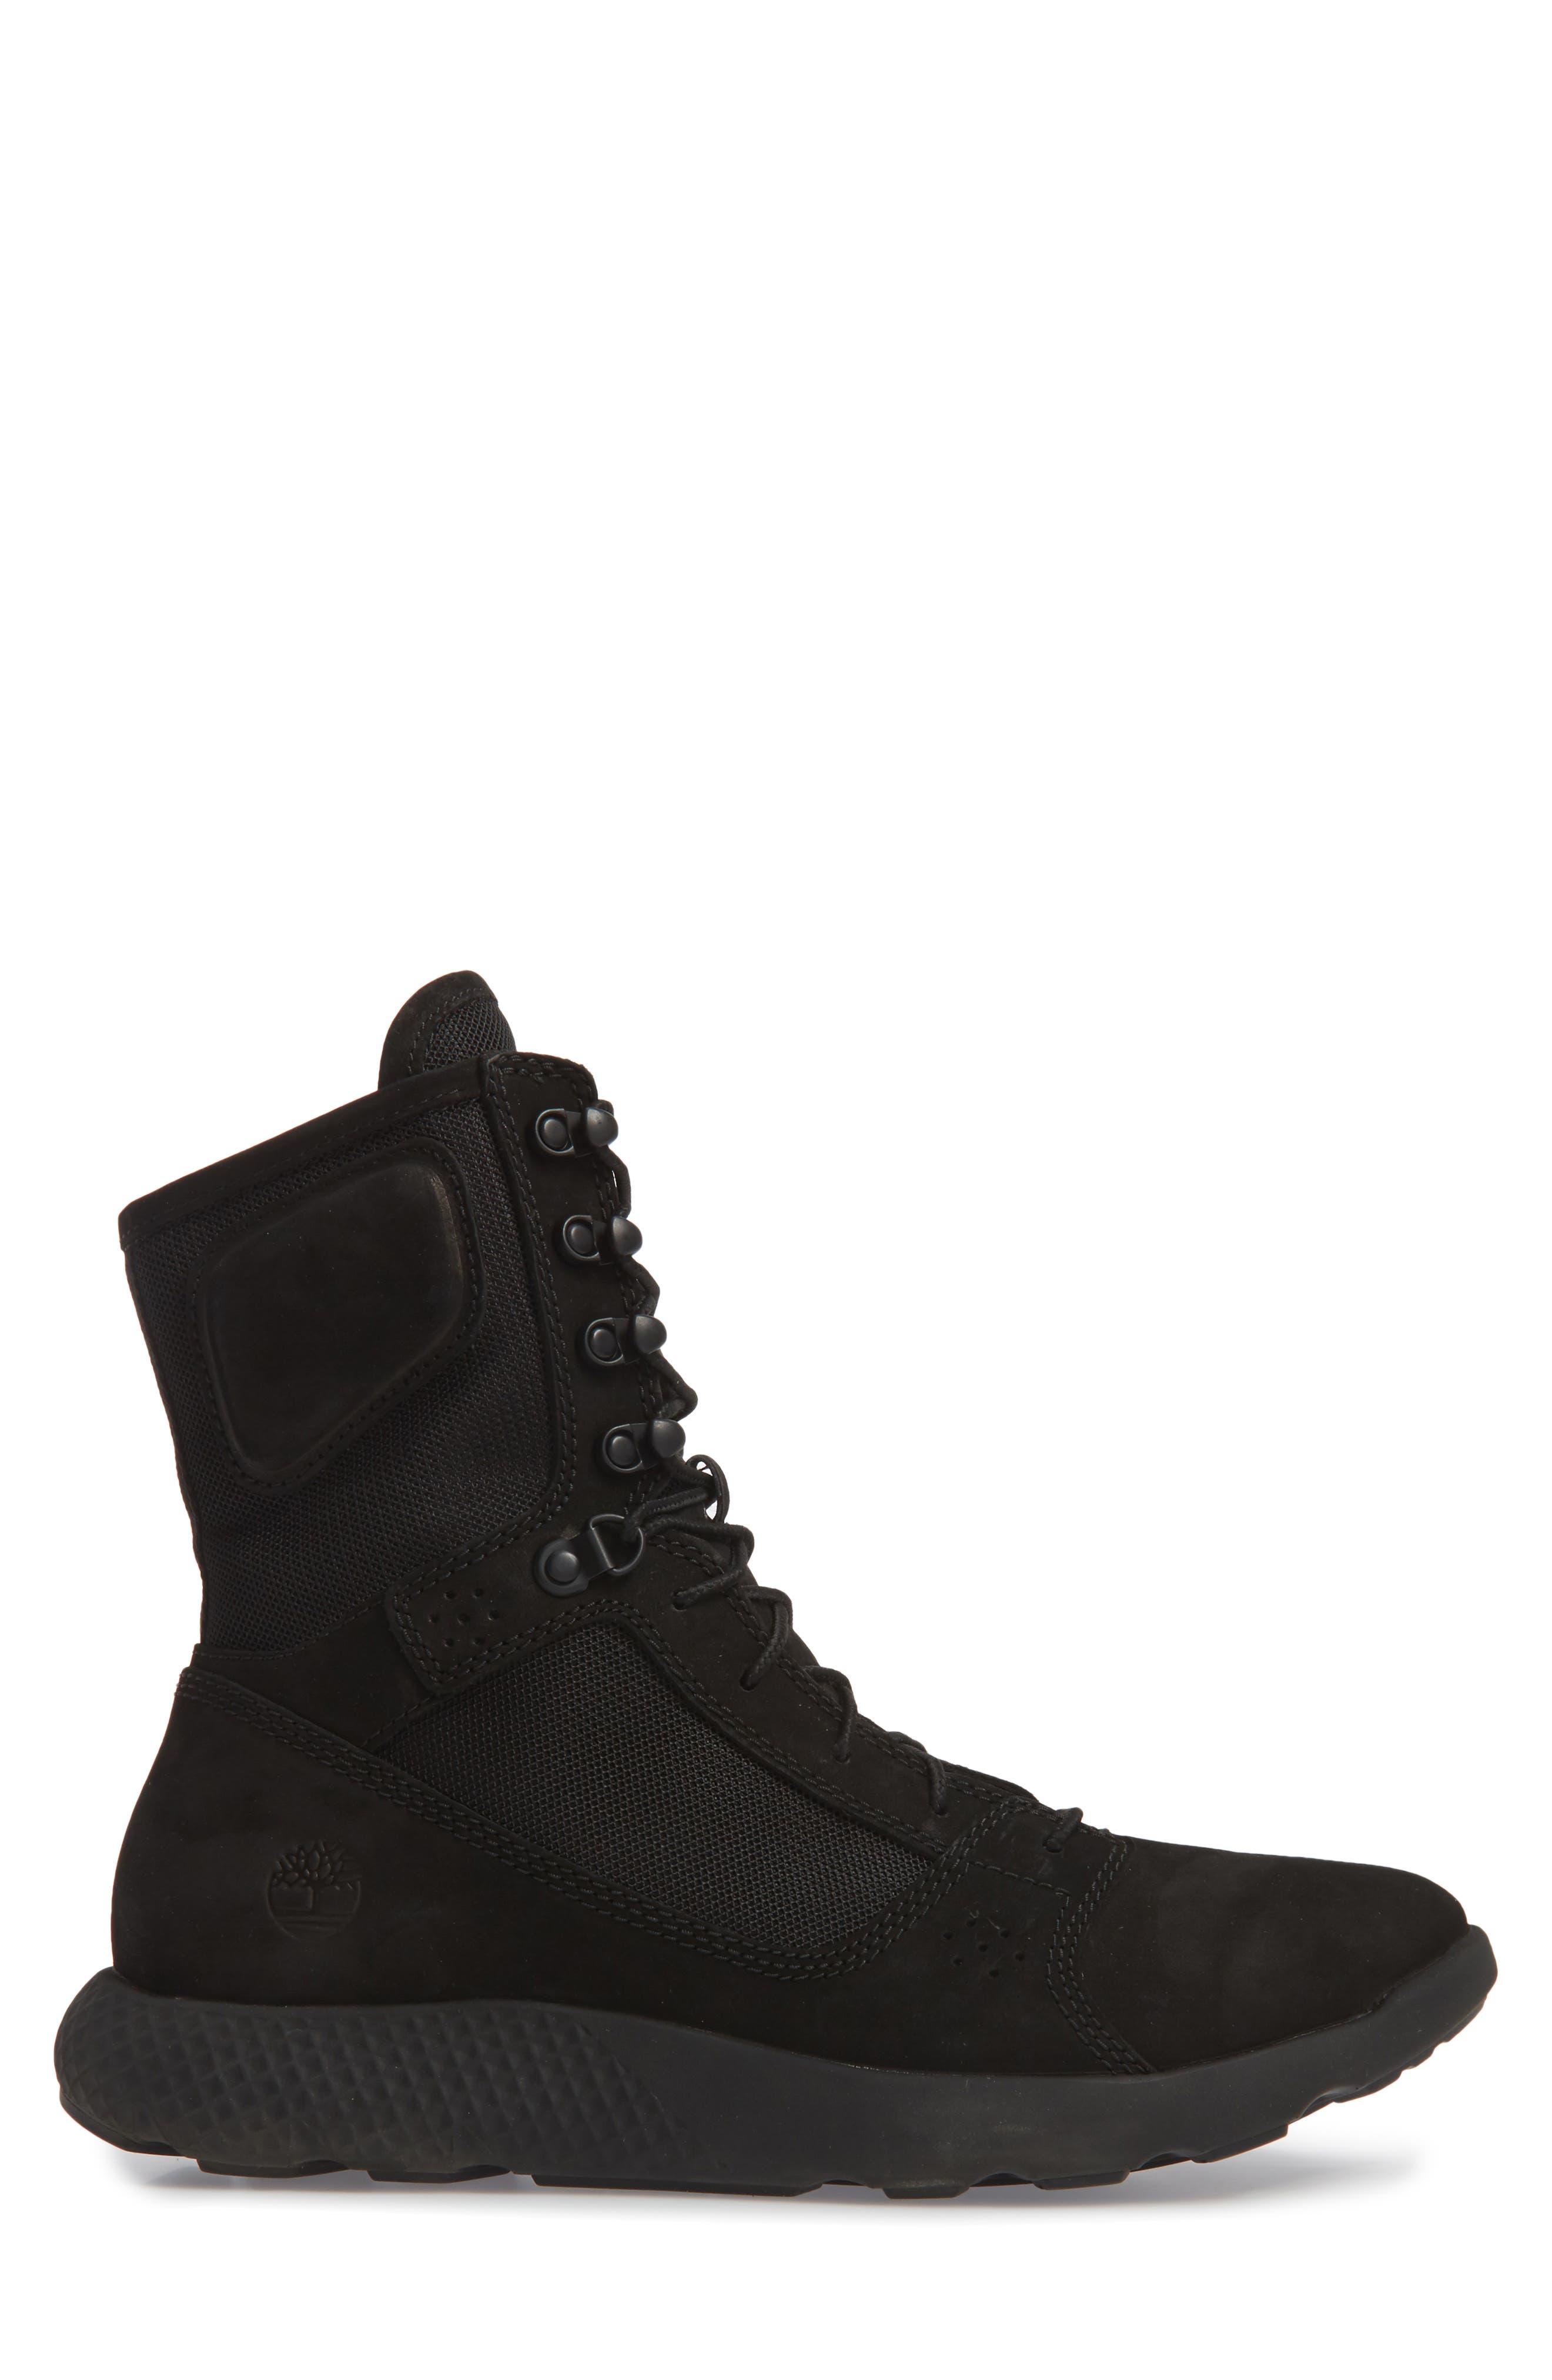 FlyRoam Tactical Boot,                             Alternate thumbnail 3, color,                             001